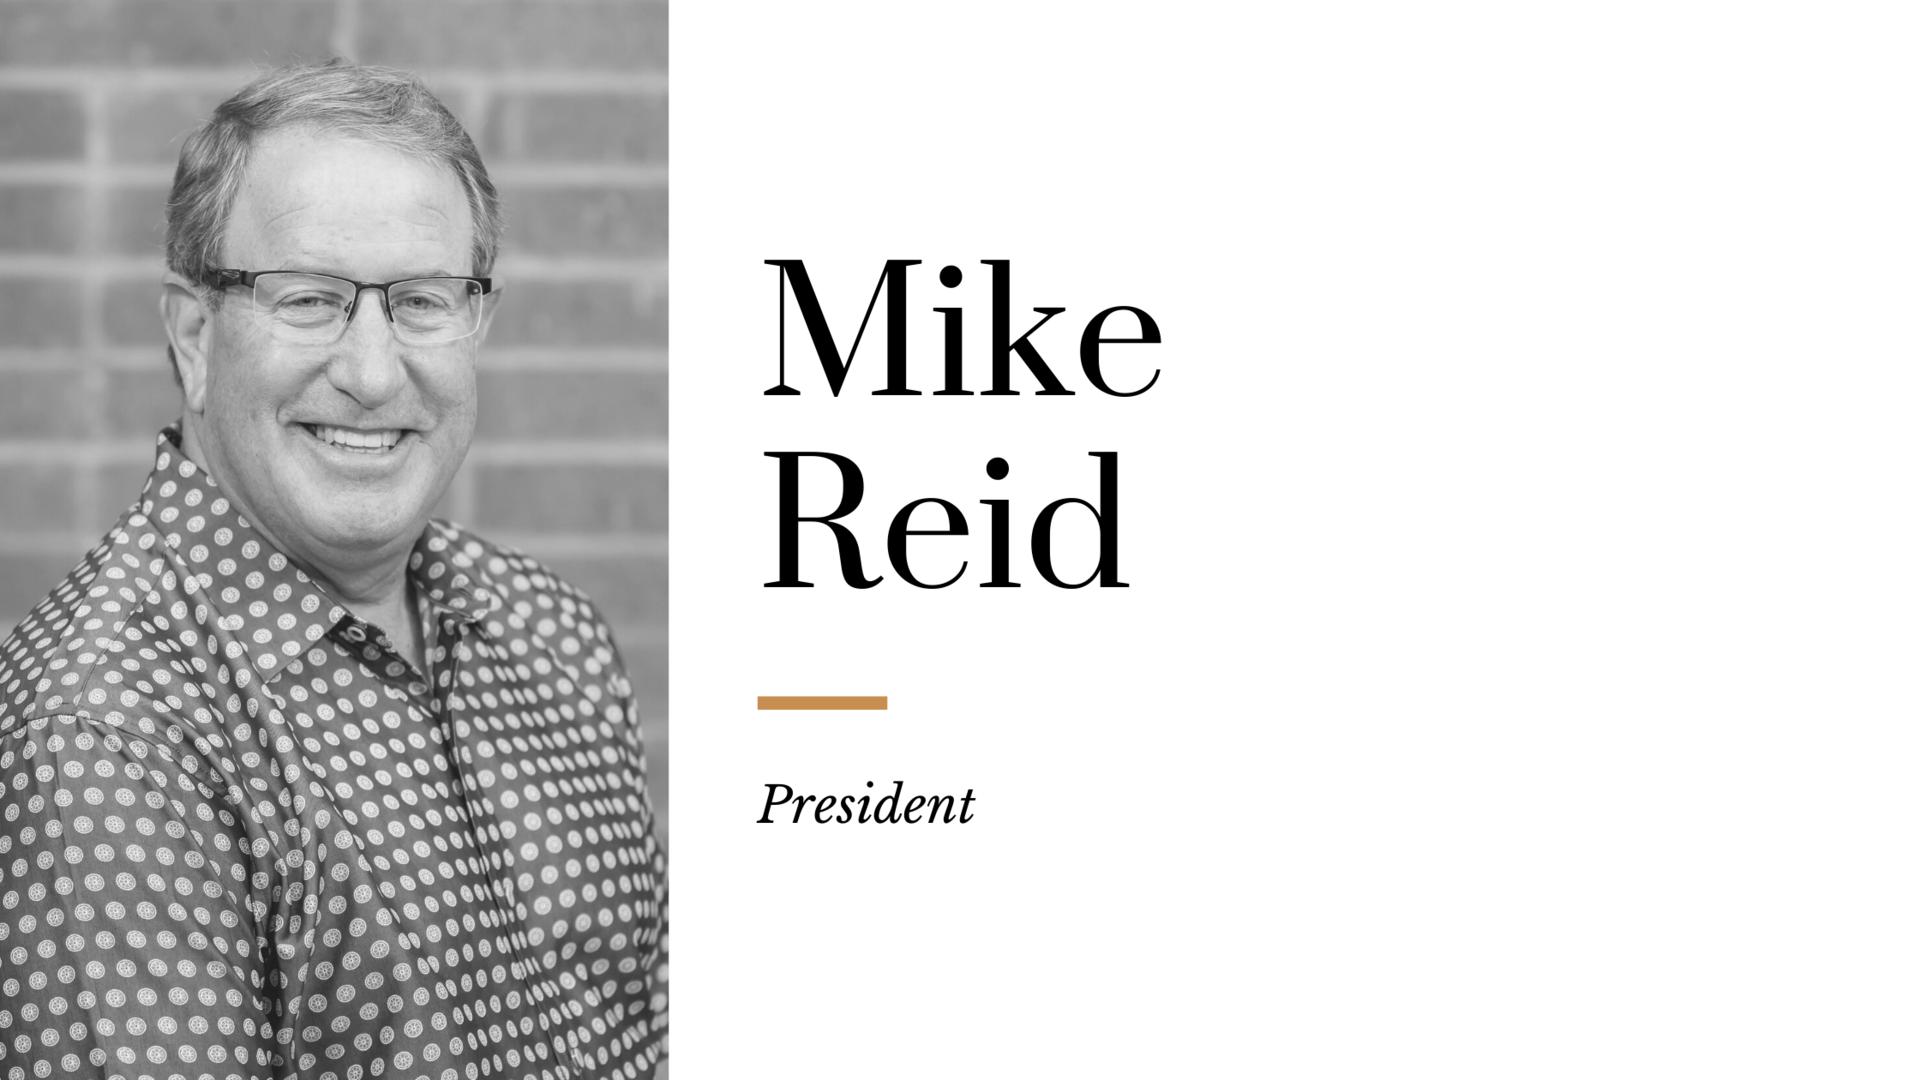 Mike Reid - President